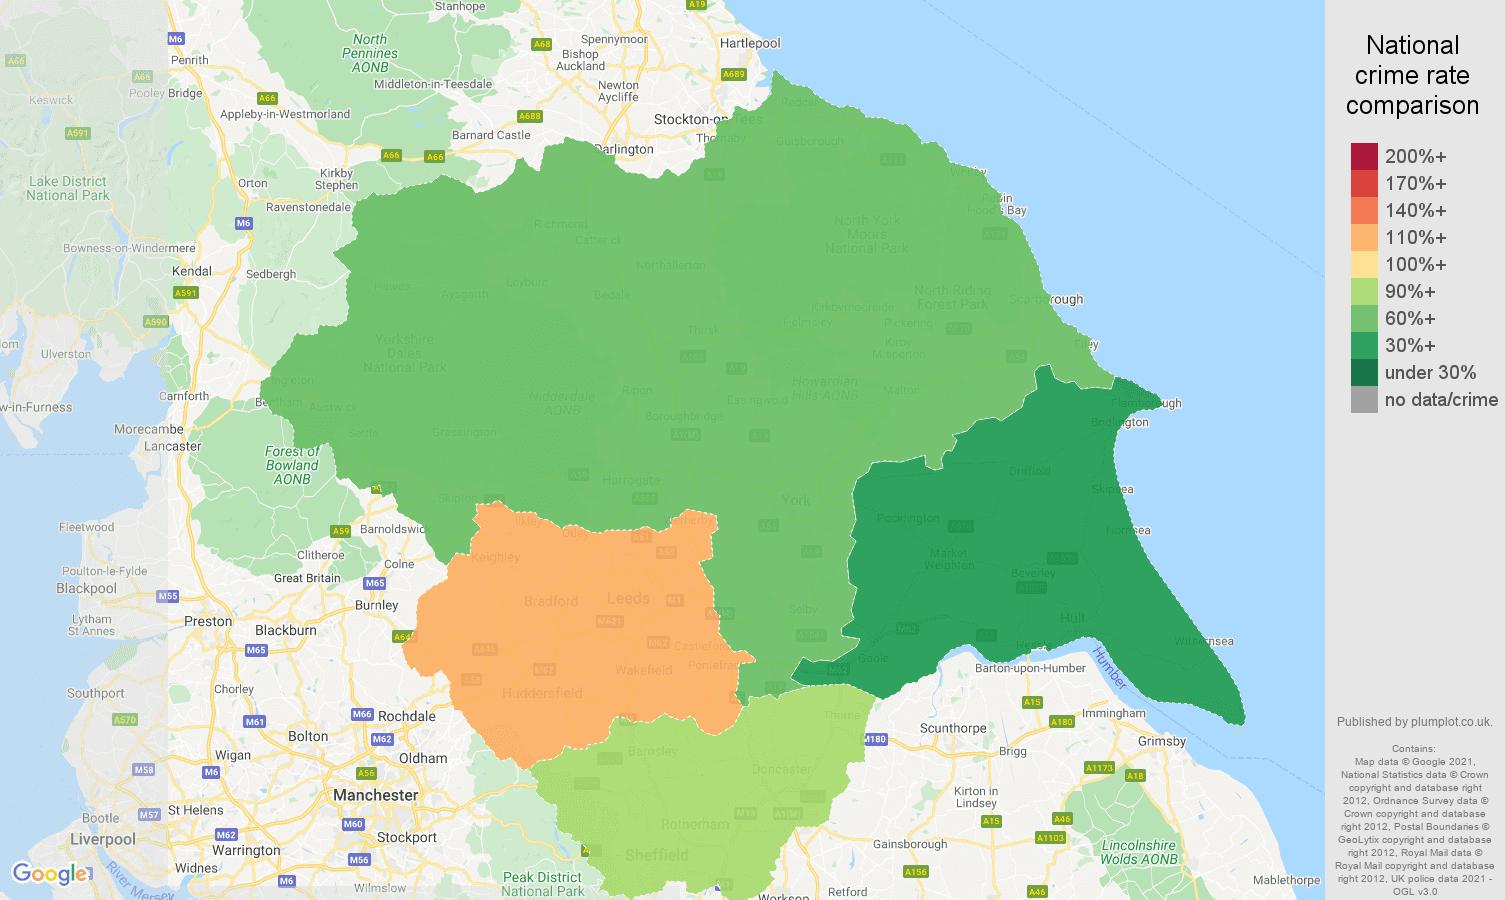 Yorkshire drugs crime rate comparison map